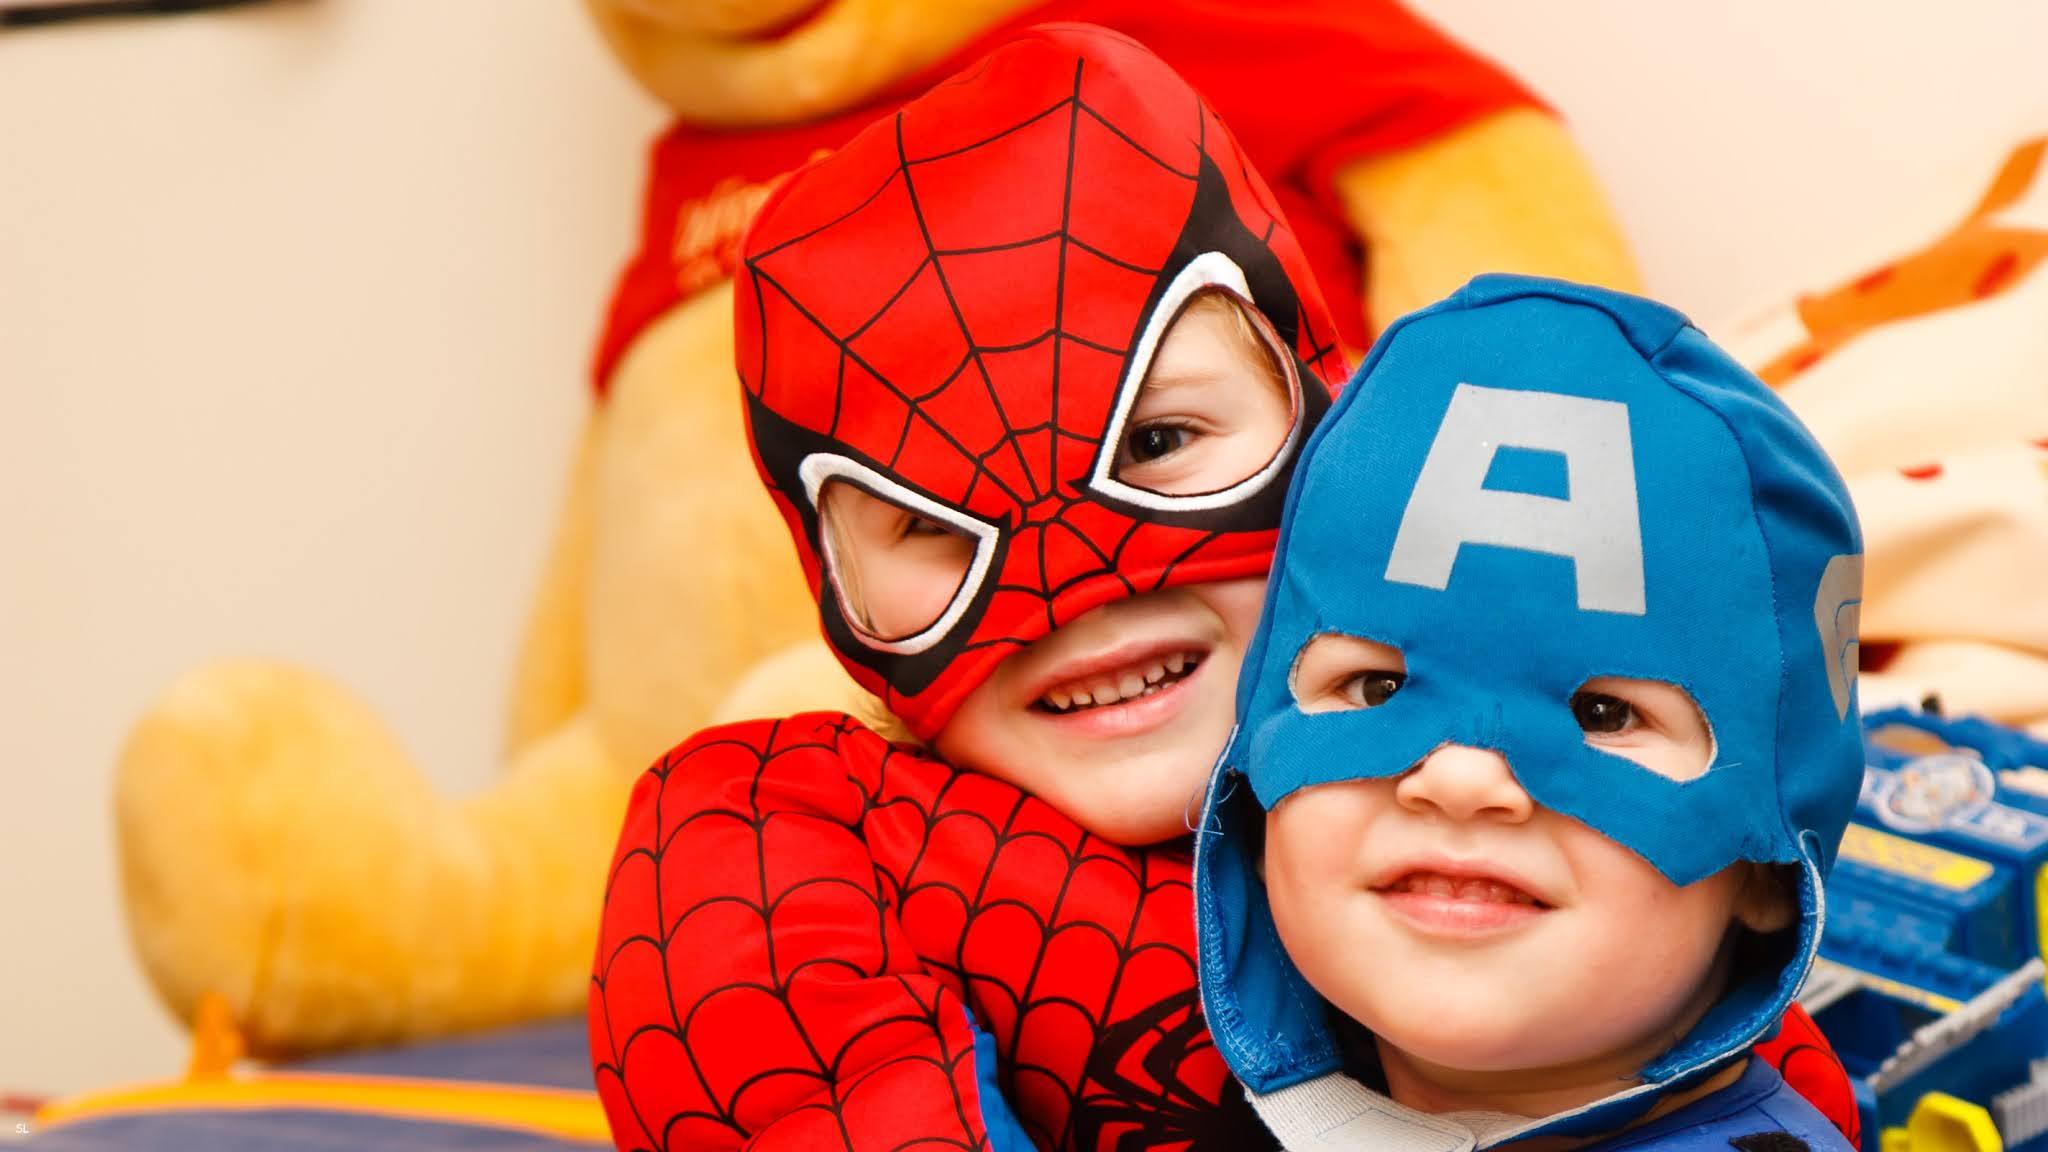 superhero children from royalty free Unsplash